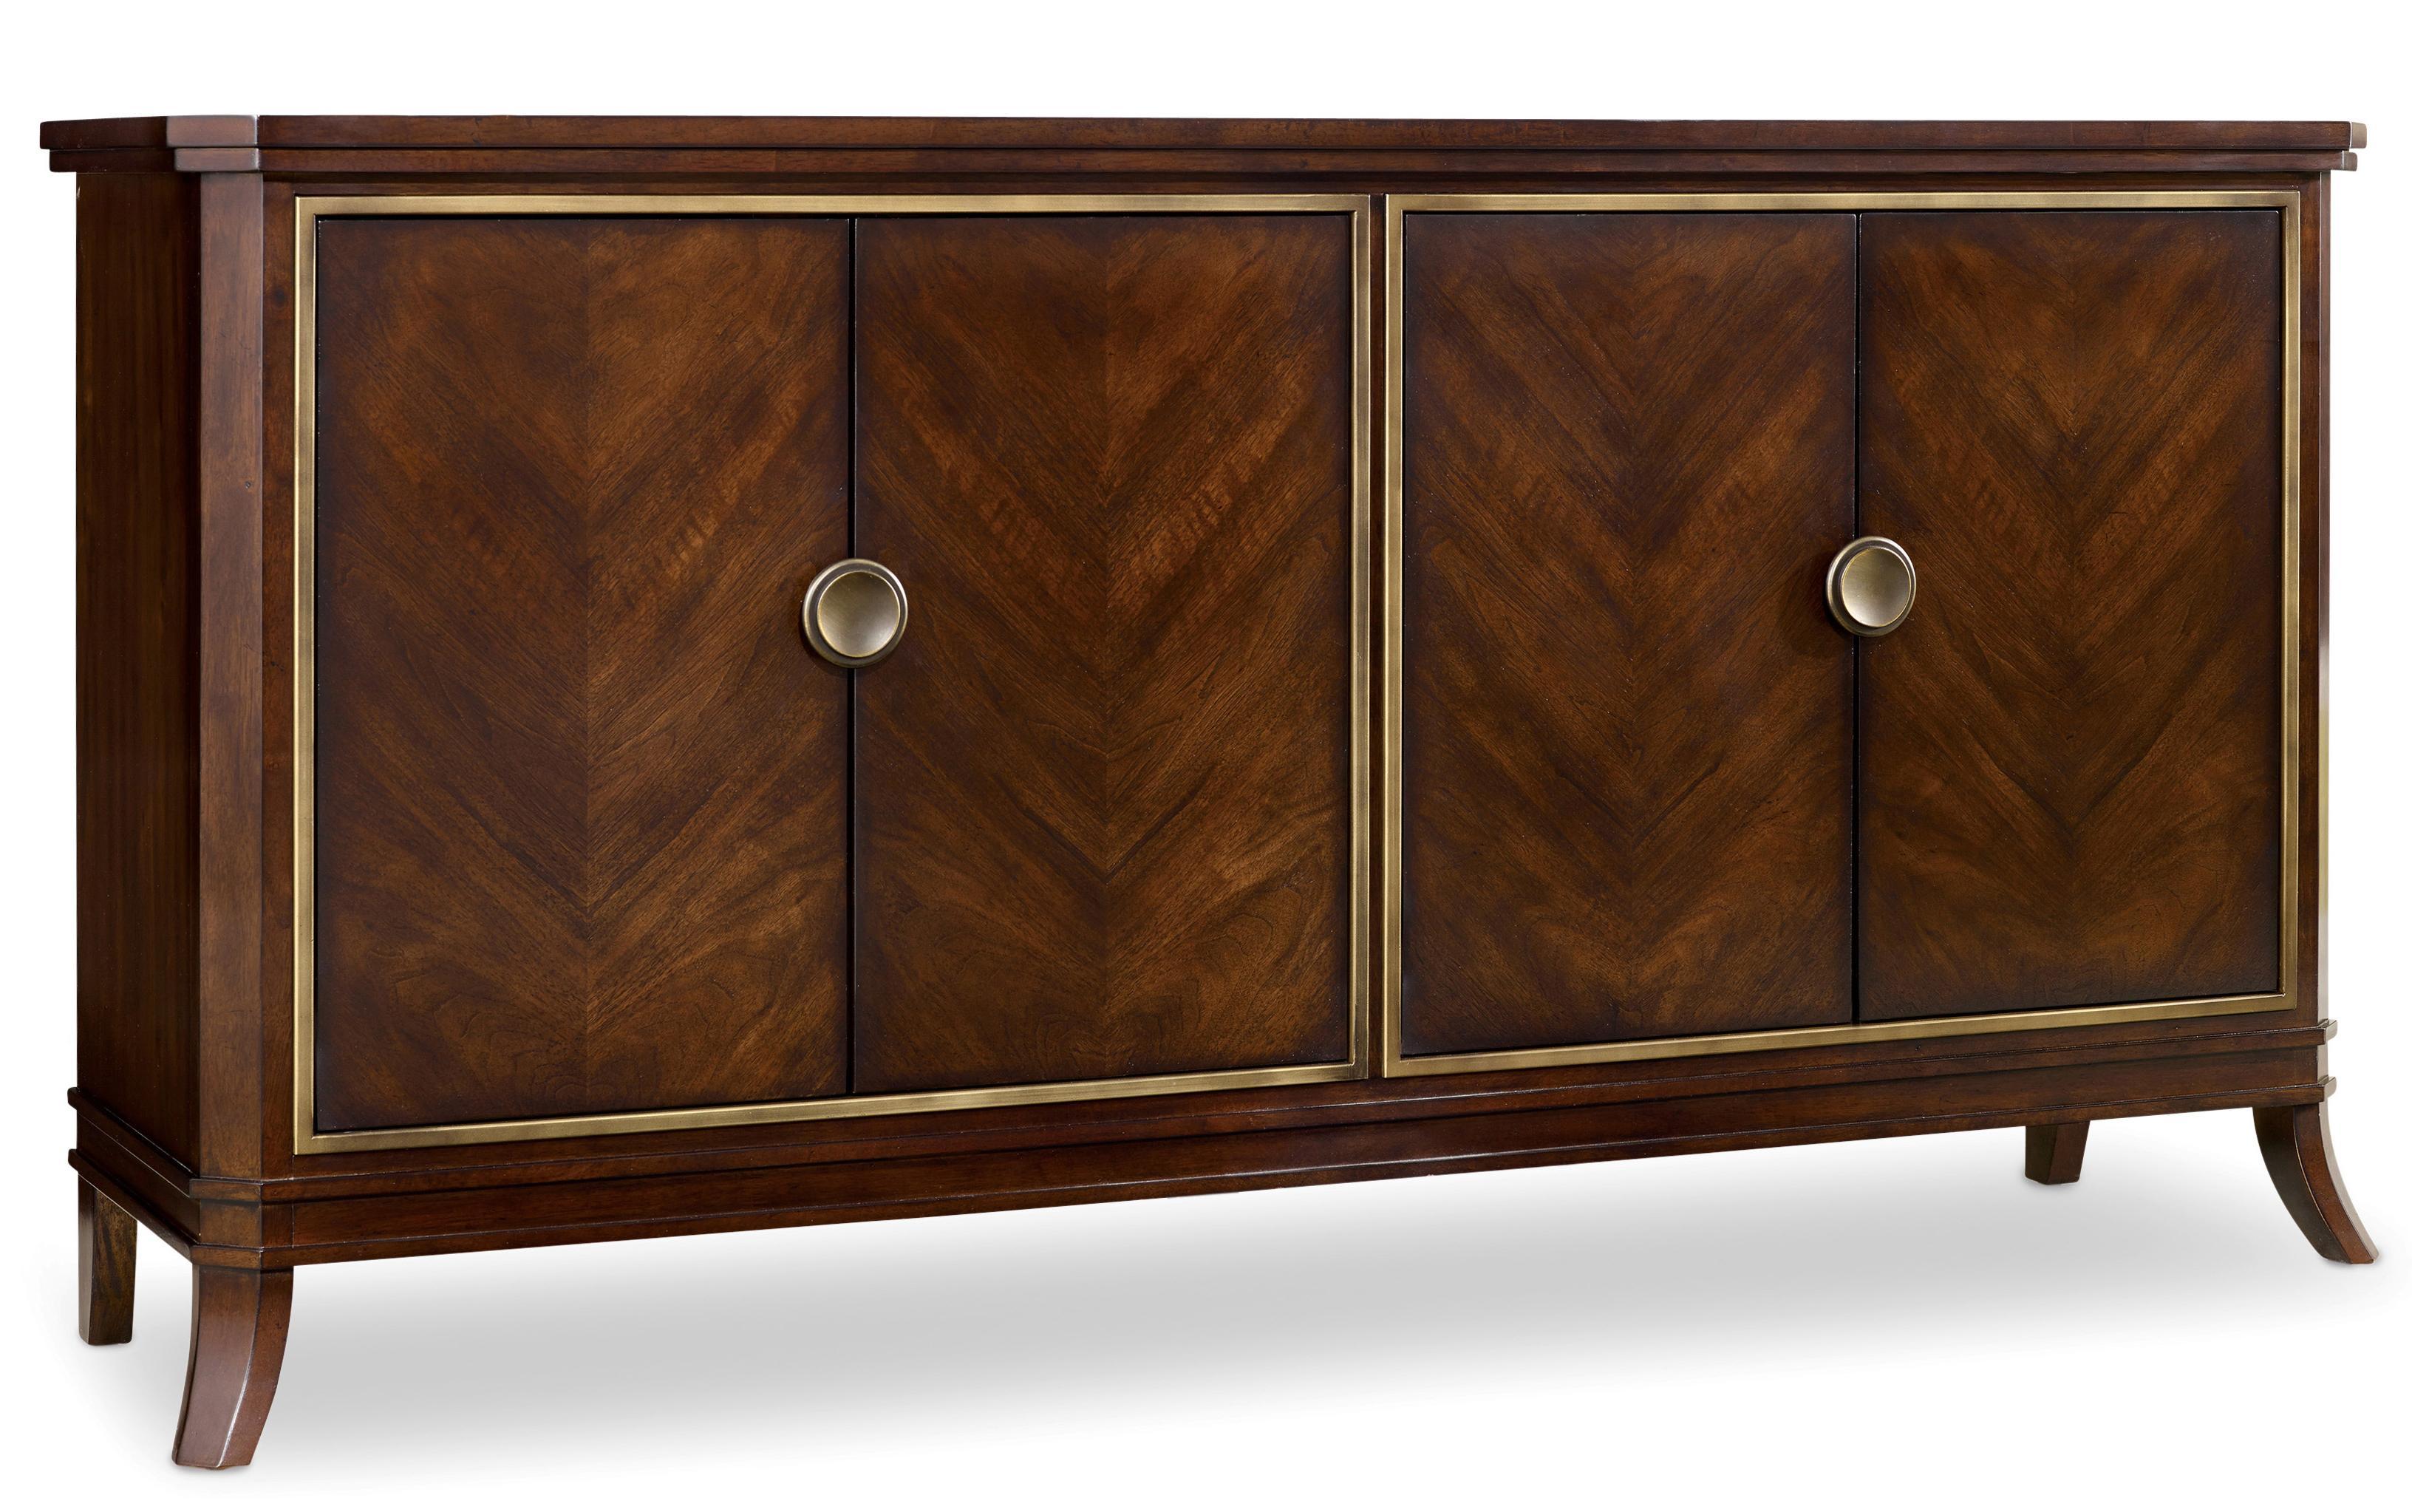 Hooker Furniture Palisade 4 Door Chest - Item Number: 5183-85001